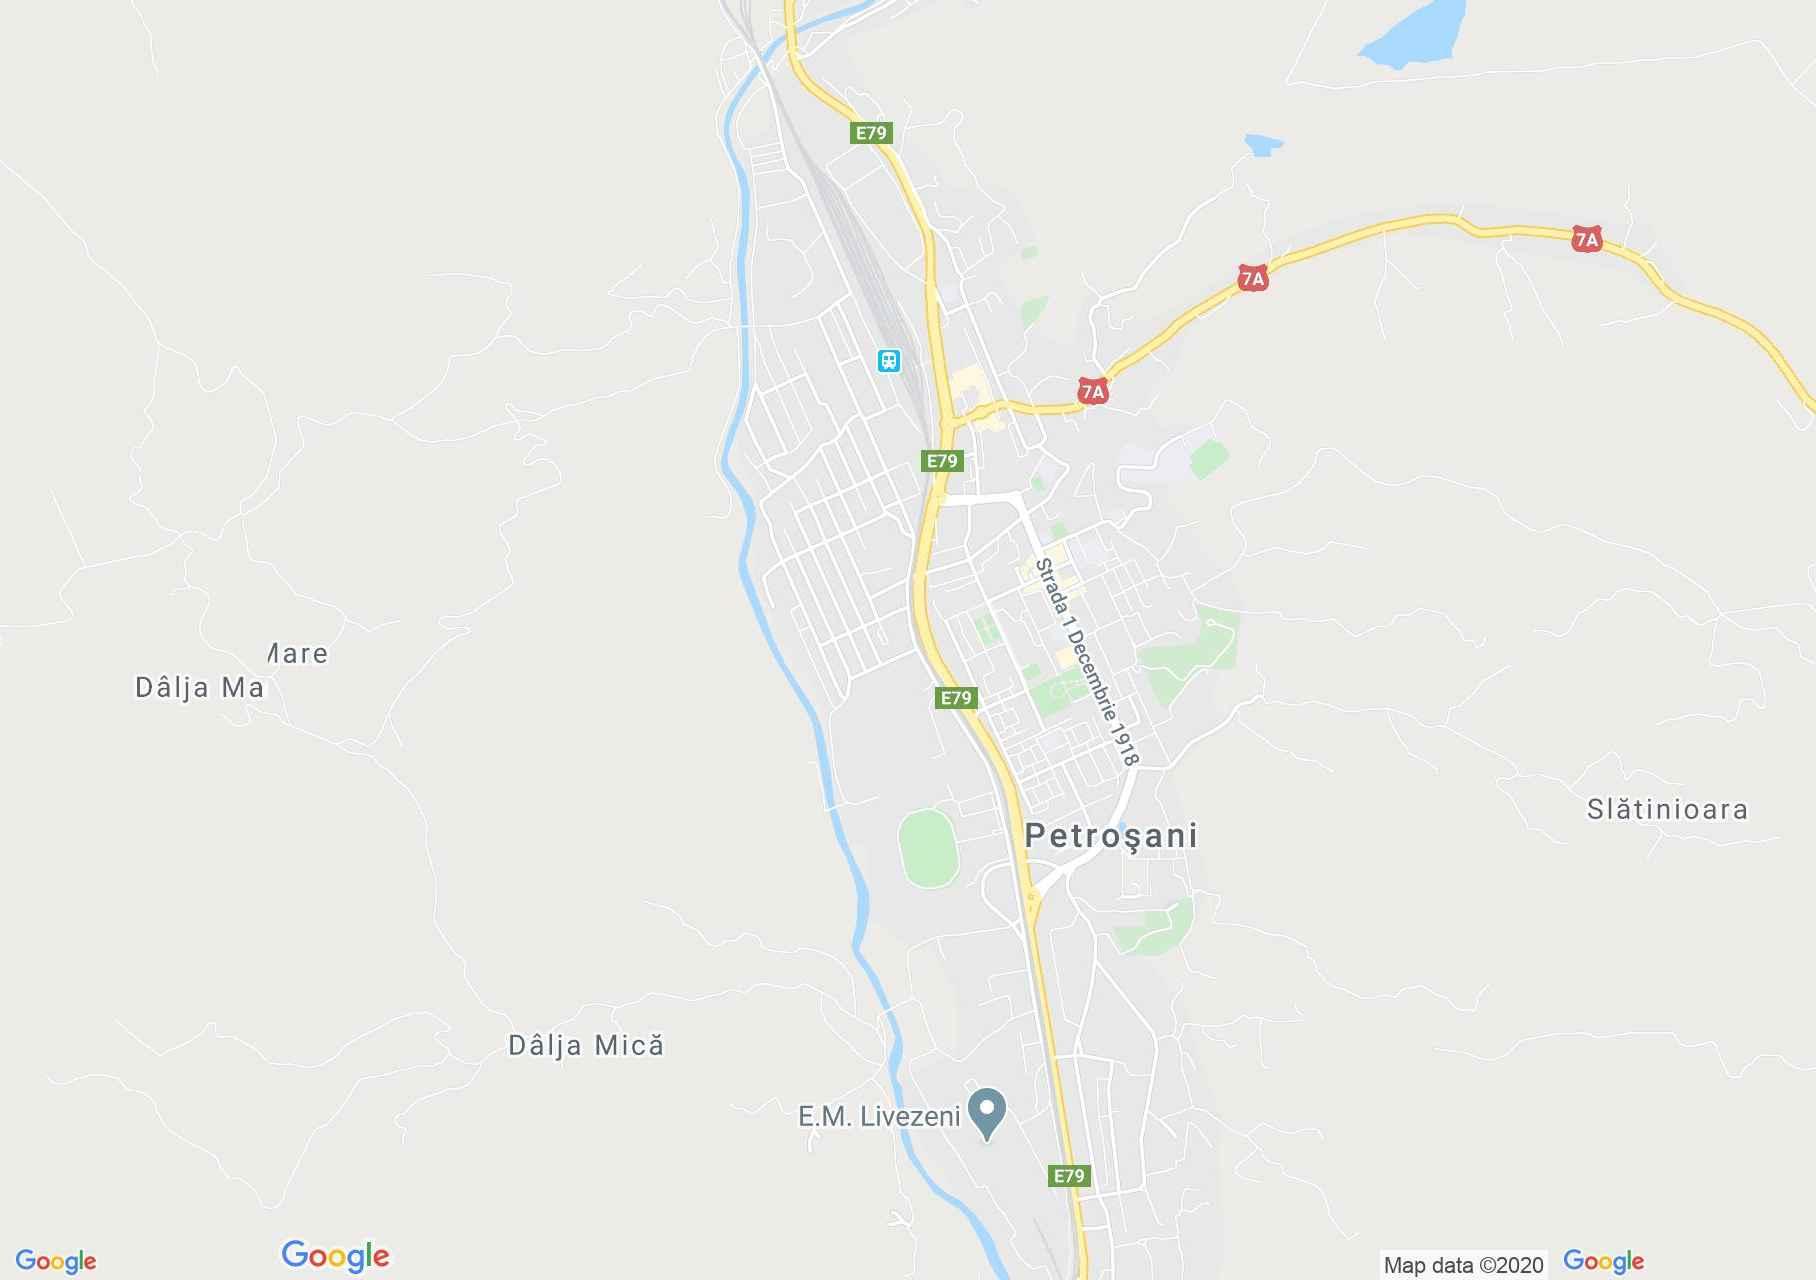 Petroşani, Interactive tourist map